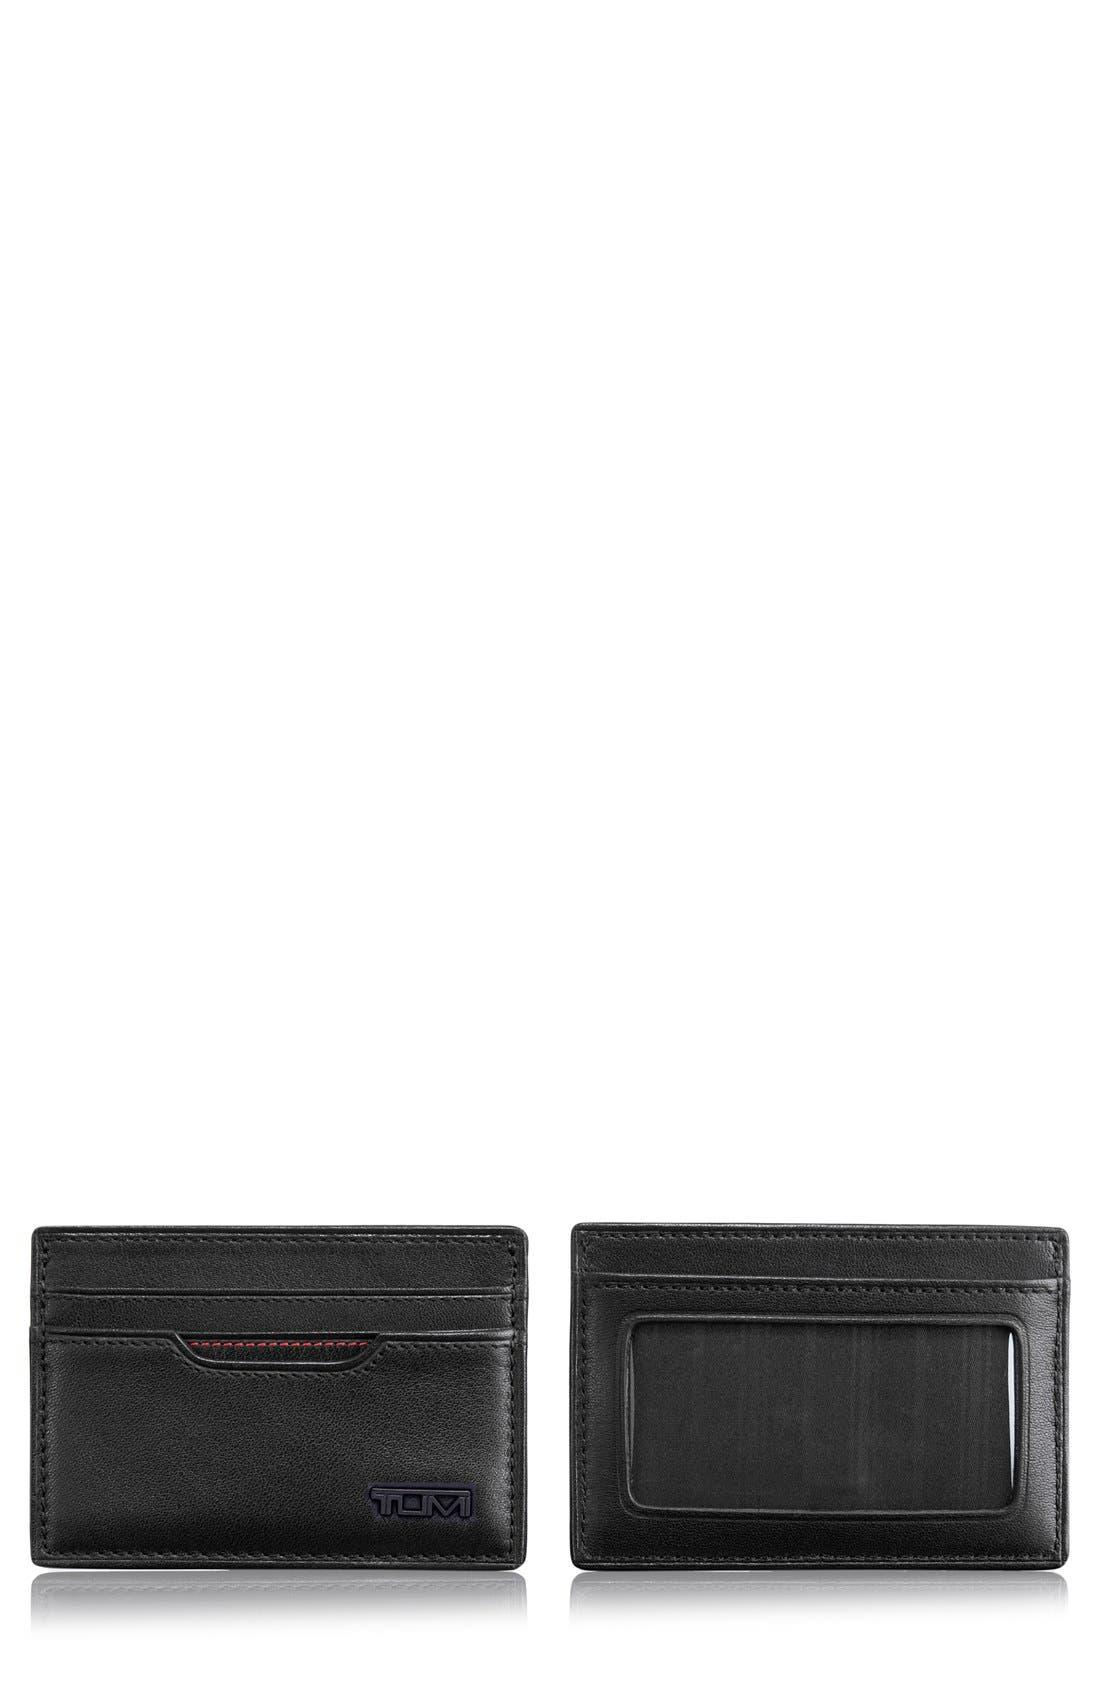 Main Image - Tumi 'Delta - ID Lock™' Shielded Slim Card Case & ID Wallet